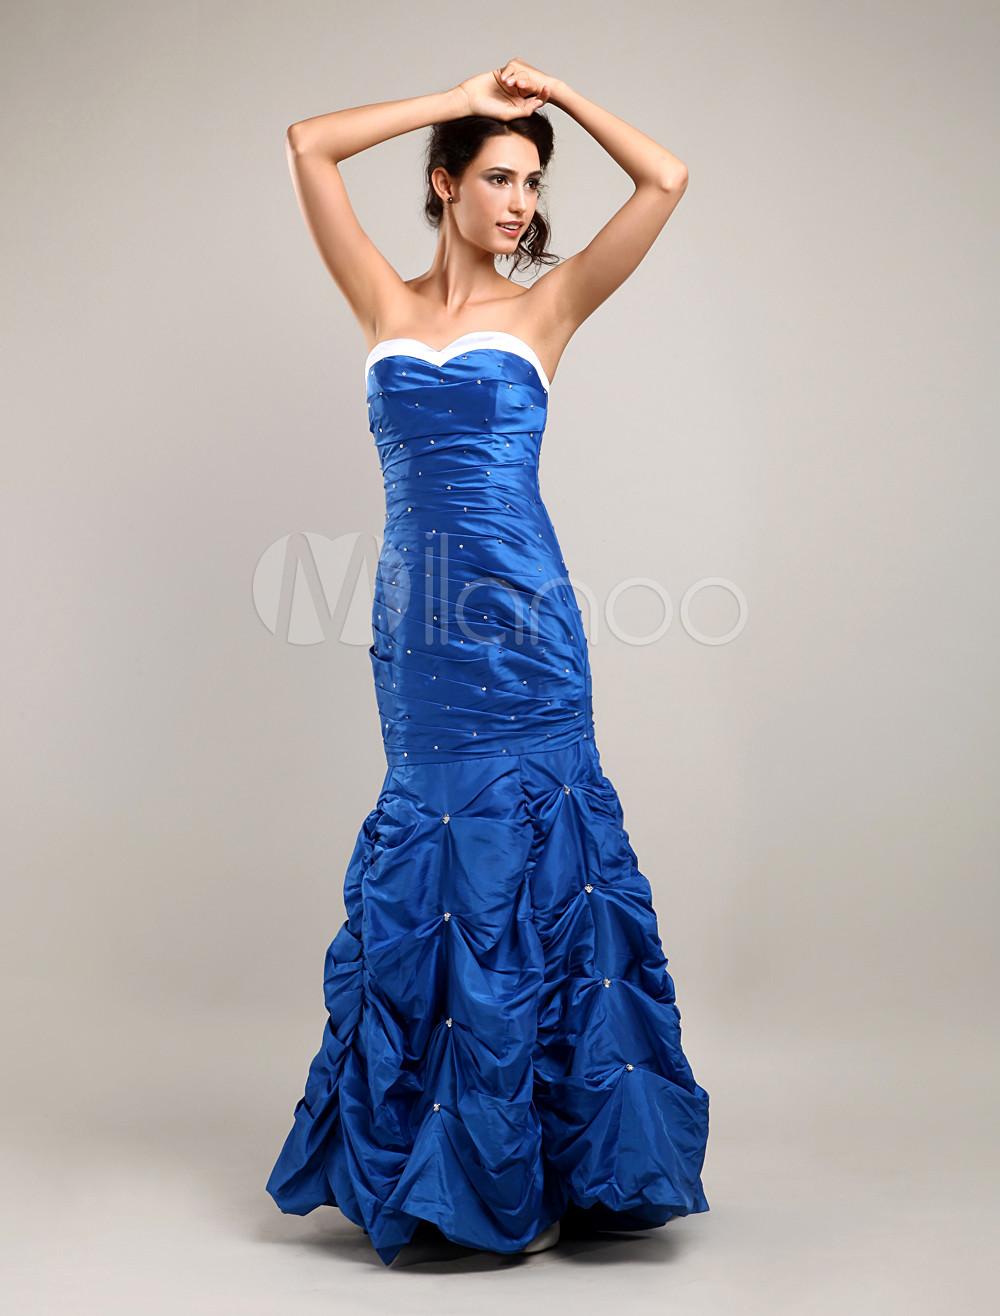 70766a5c4b3 Homecoming Dresses Around Me